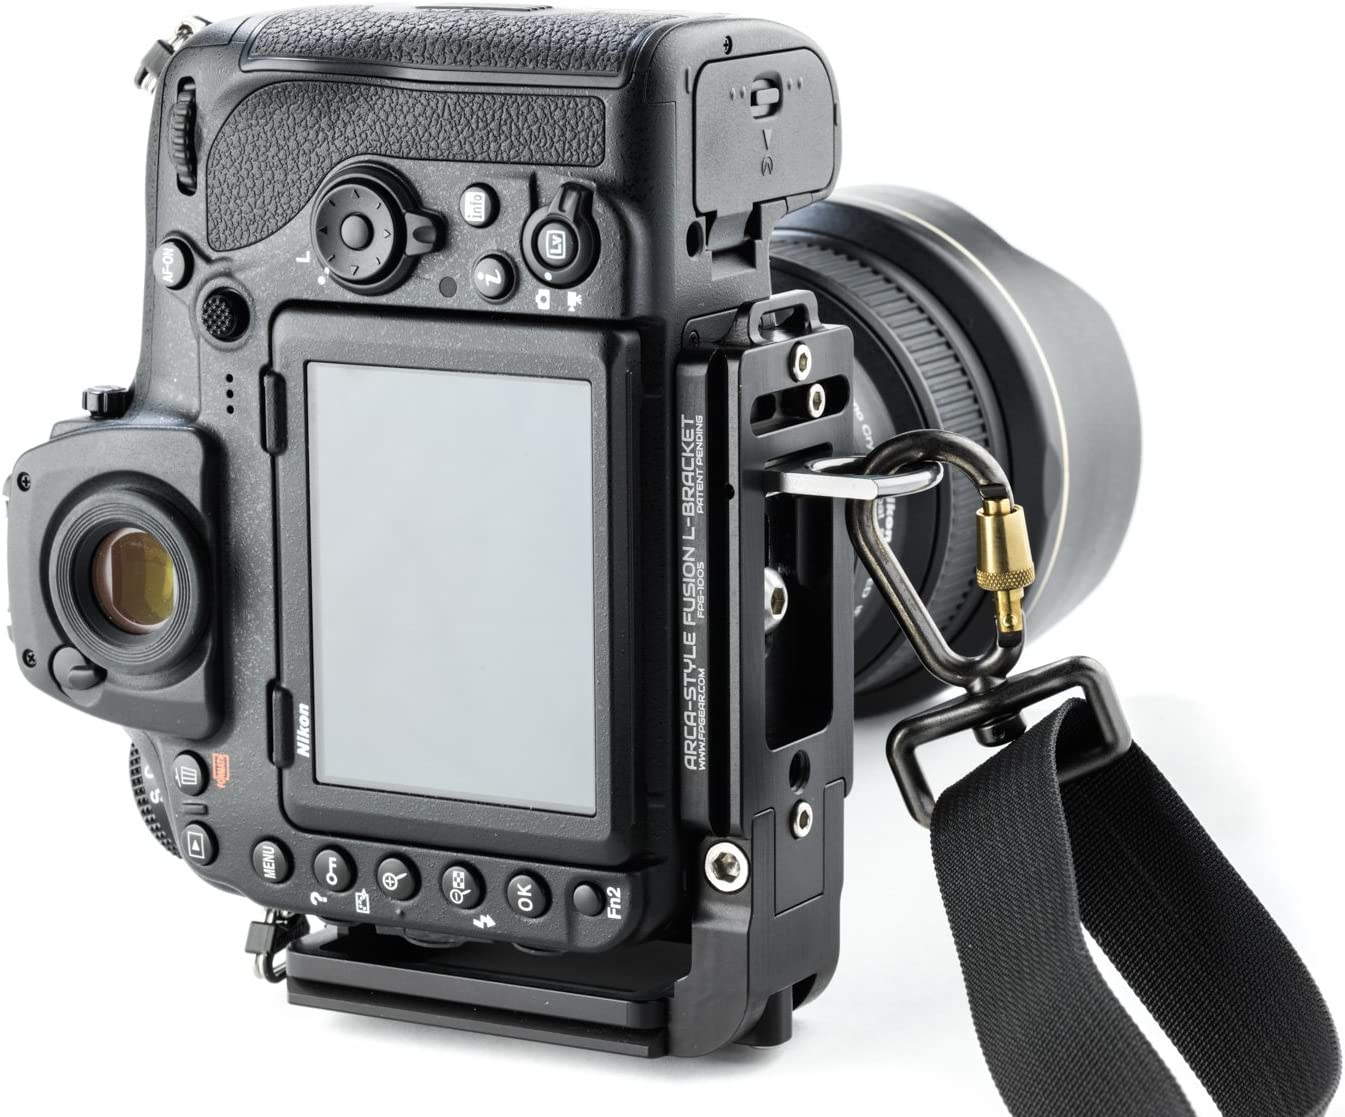 Tamron Lenshood #RHAFB003 for AF18-270mm f//3.5-6.3 Di-II VC Zoom Lens